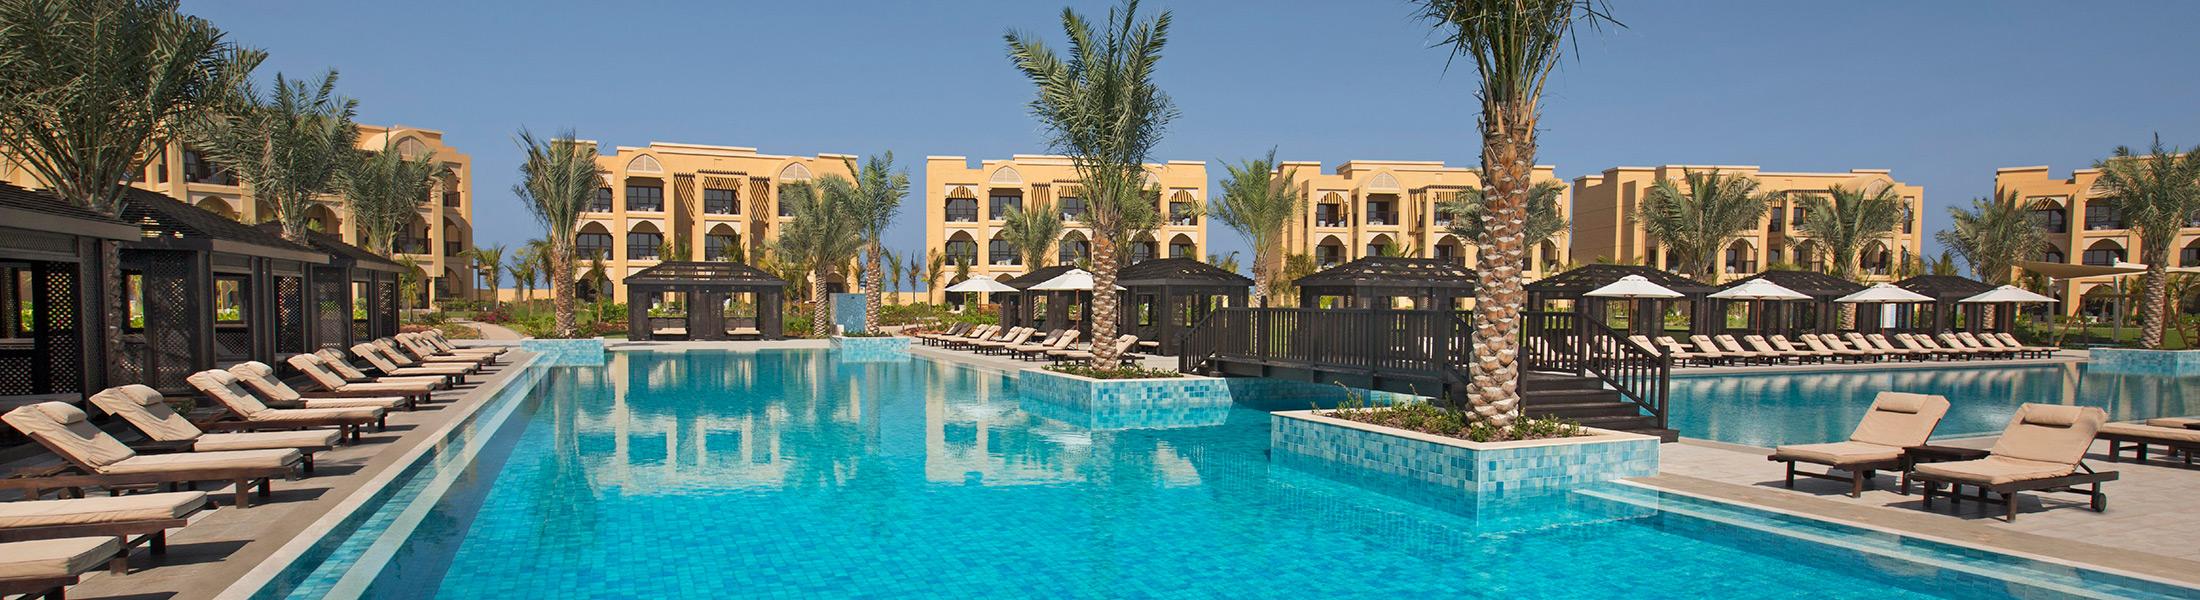 The Villas pool at DoubleTree by Hilton Marjan Island